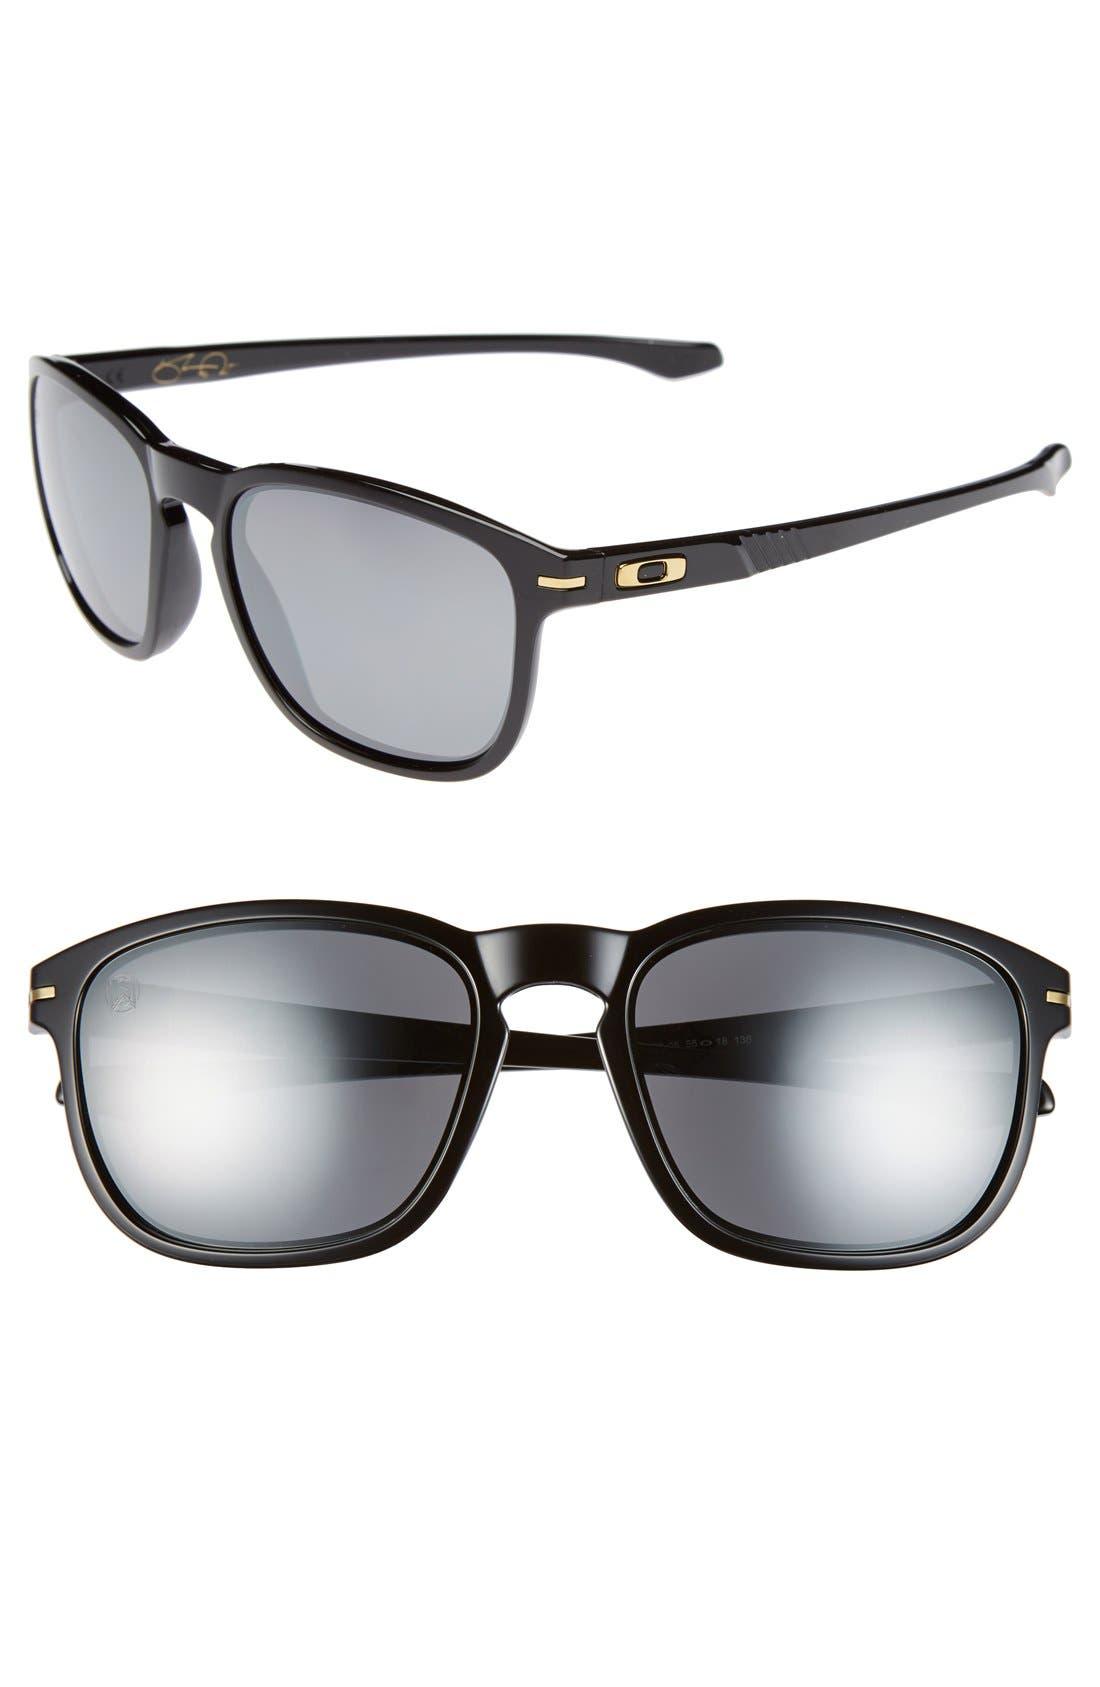 Main Image - Oakley 'Shaun White Signature Series - Enduro' 55mm Polarized Sunglasses